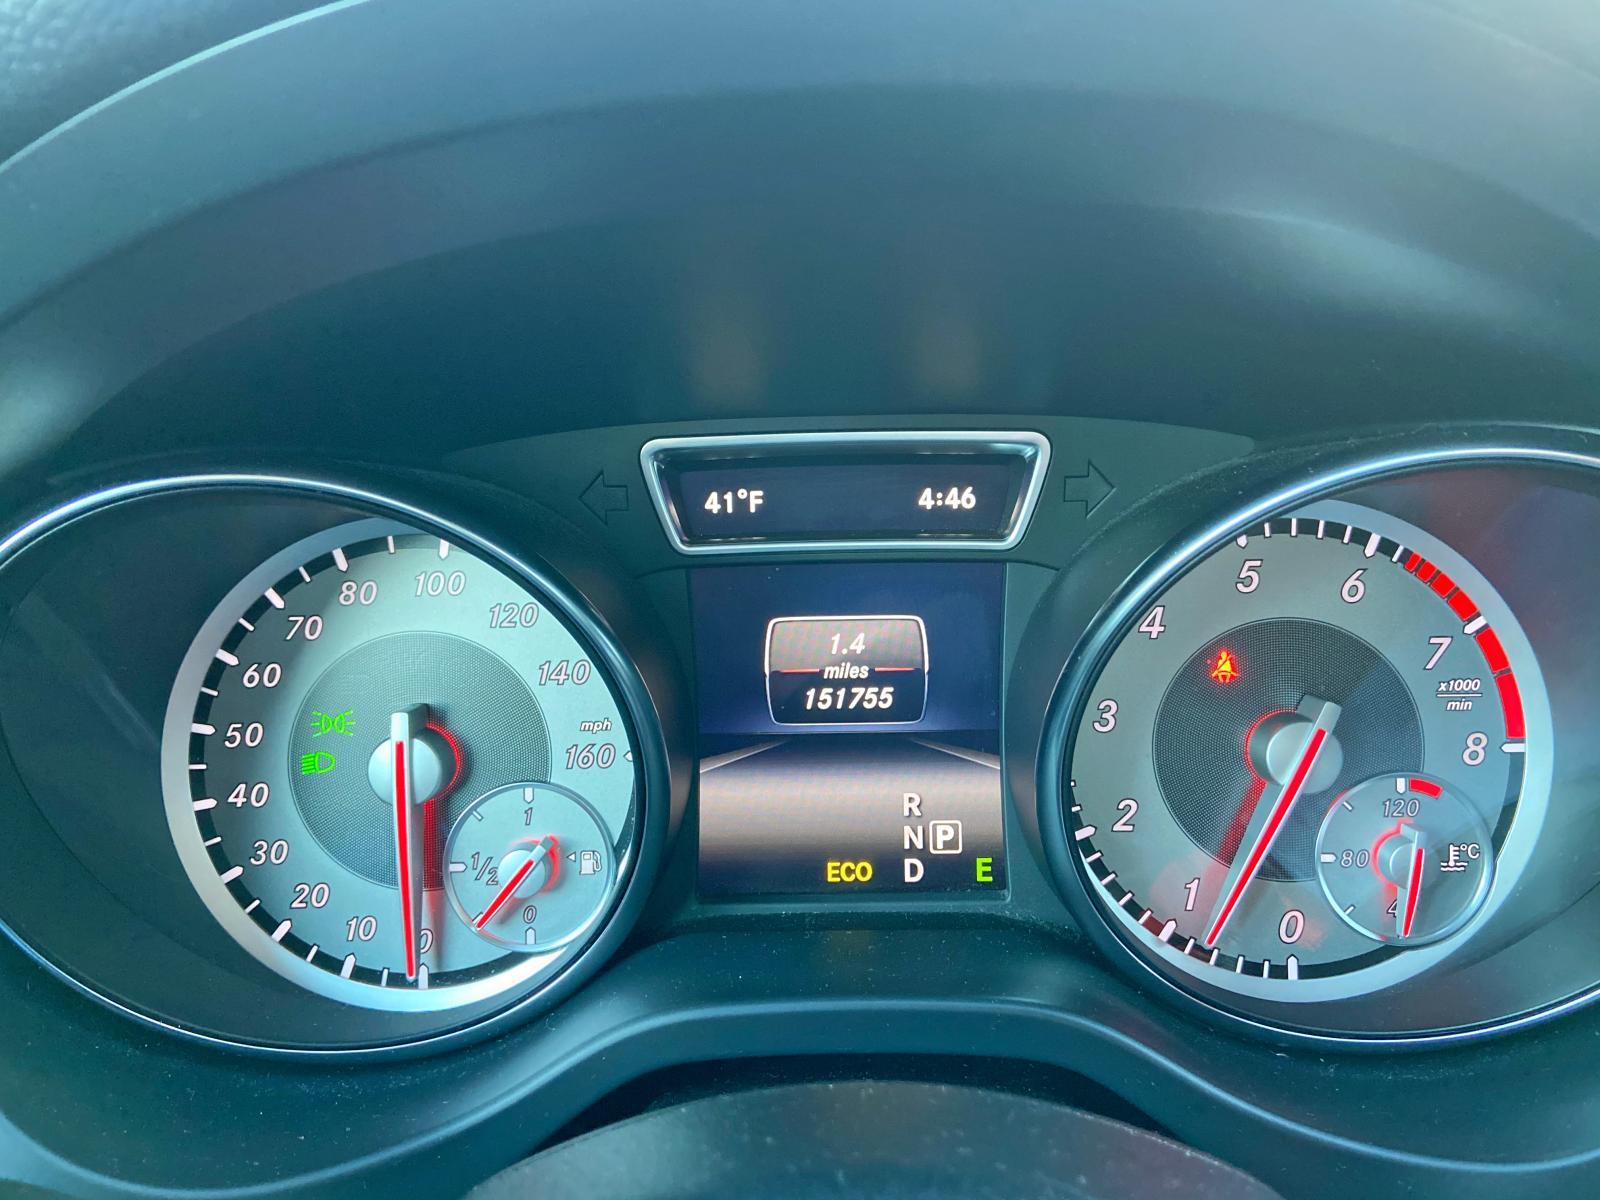 WDDSJ4EB9EN060365 - 2014 Mercedes-Benz Cla 250 2.0L inside view